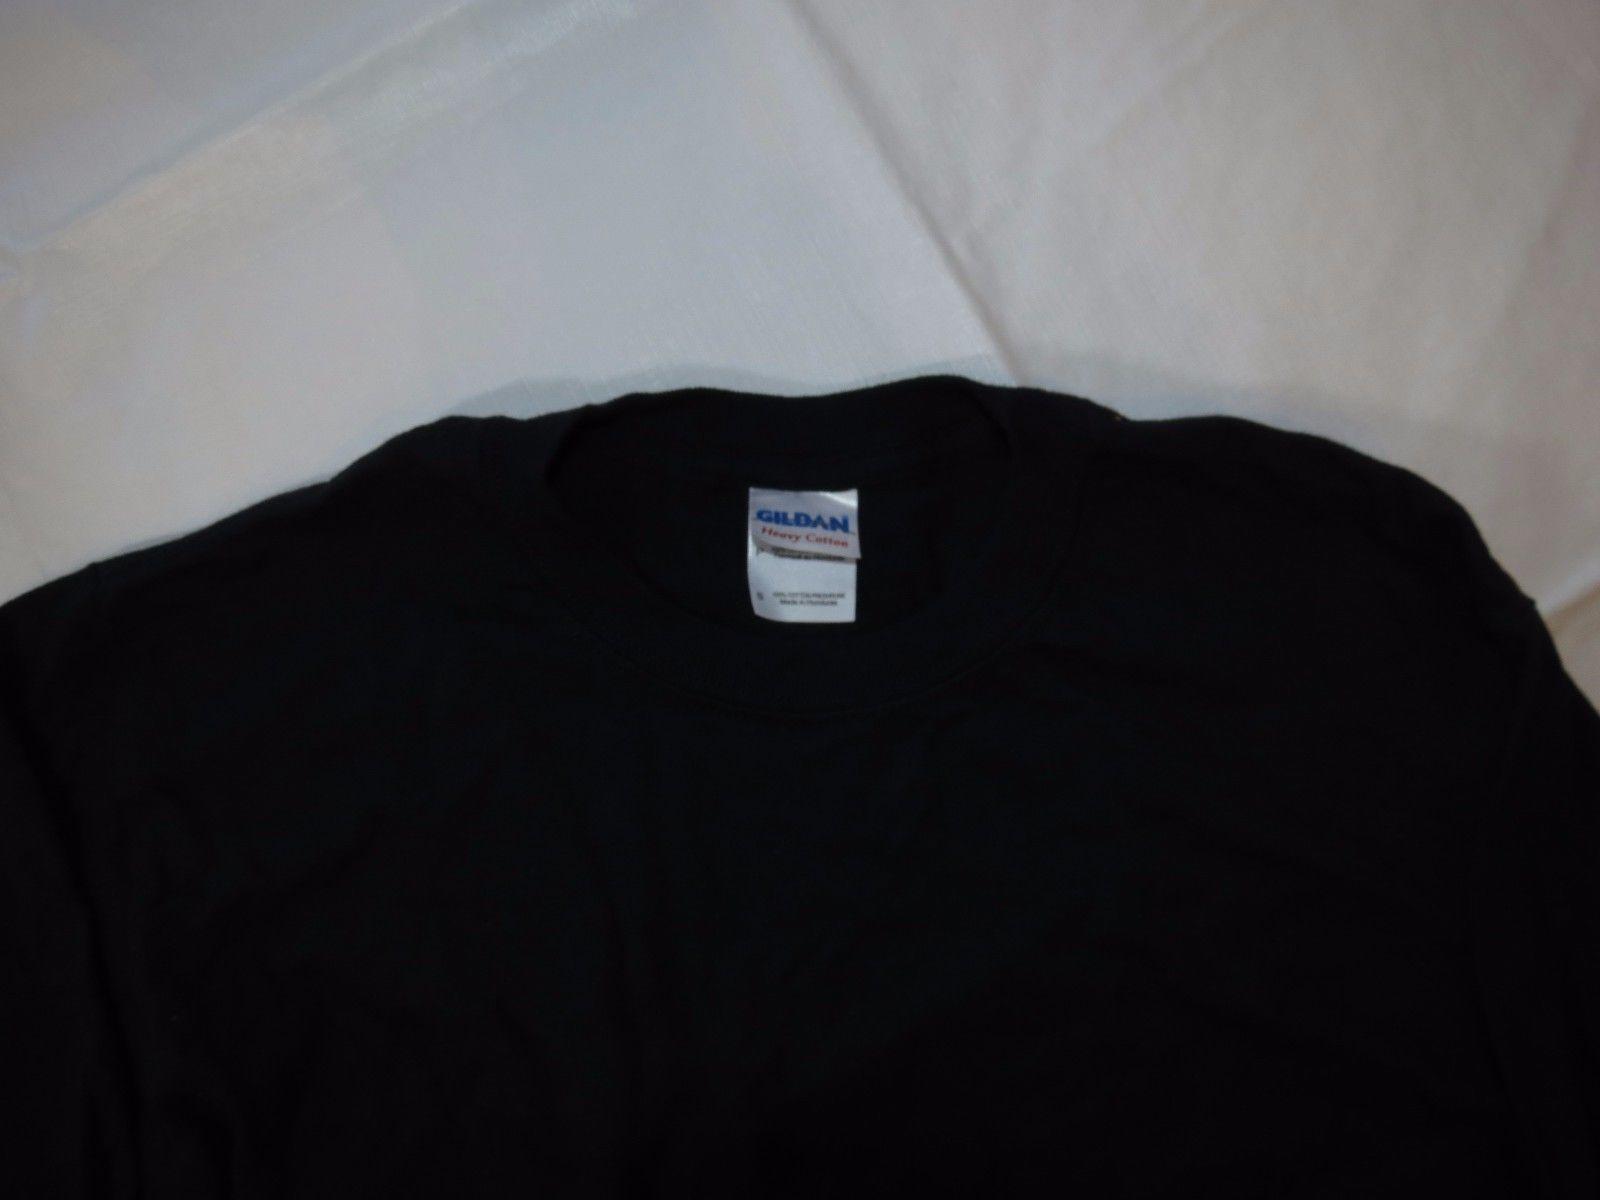 Gildan Heavy Cotton adult XL xlarge mens long sleeve t shirt black casual NOS